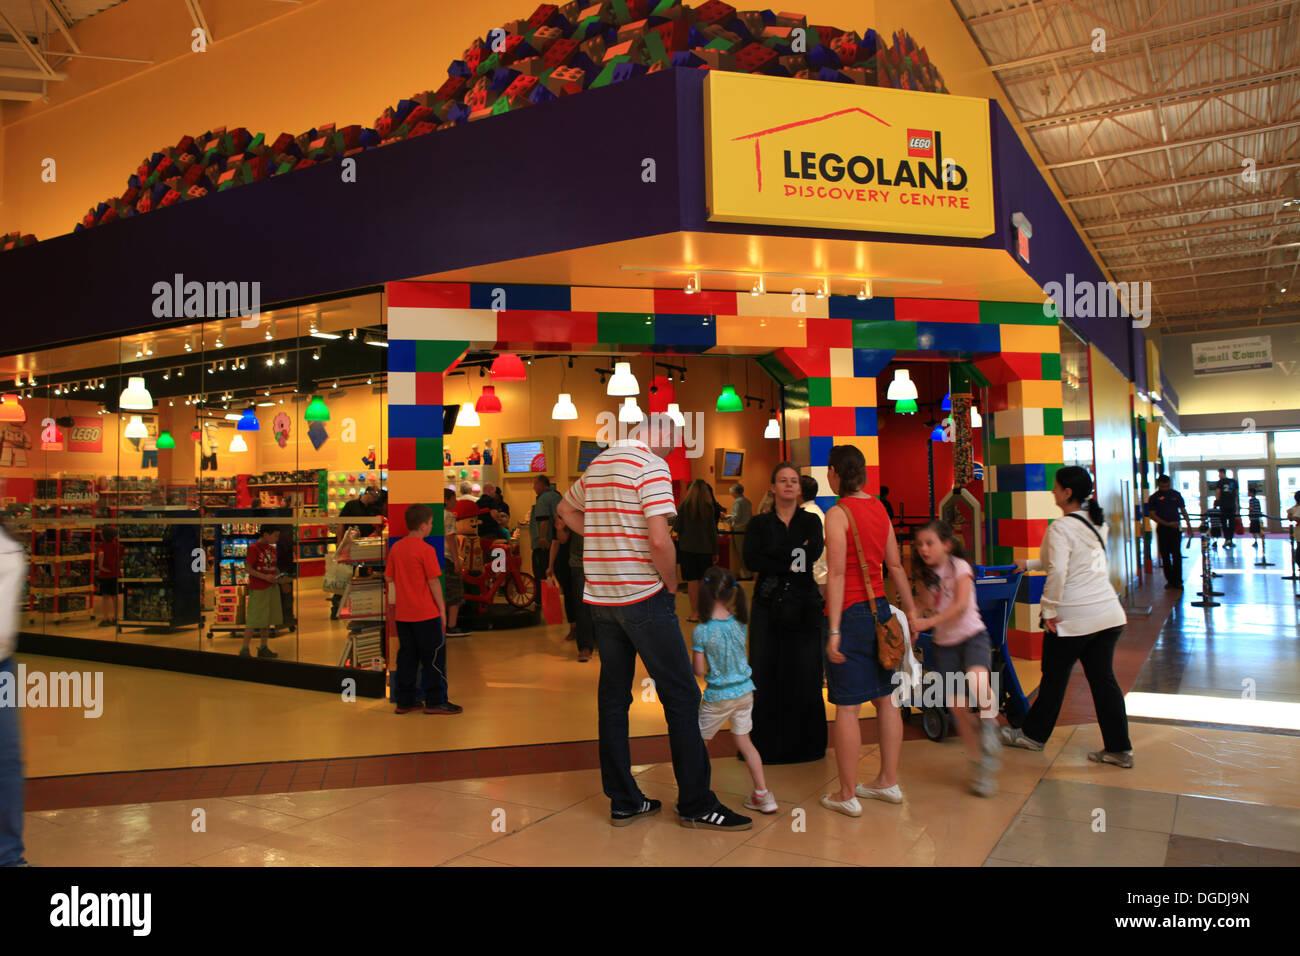 Legoland store in Vaughan Mills Mall, Toronto, Canada ...